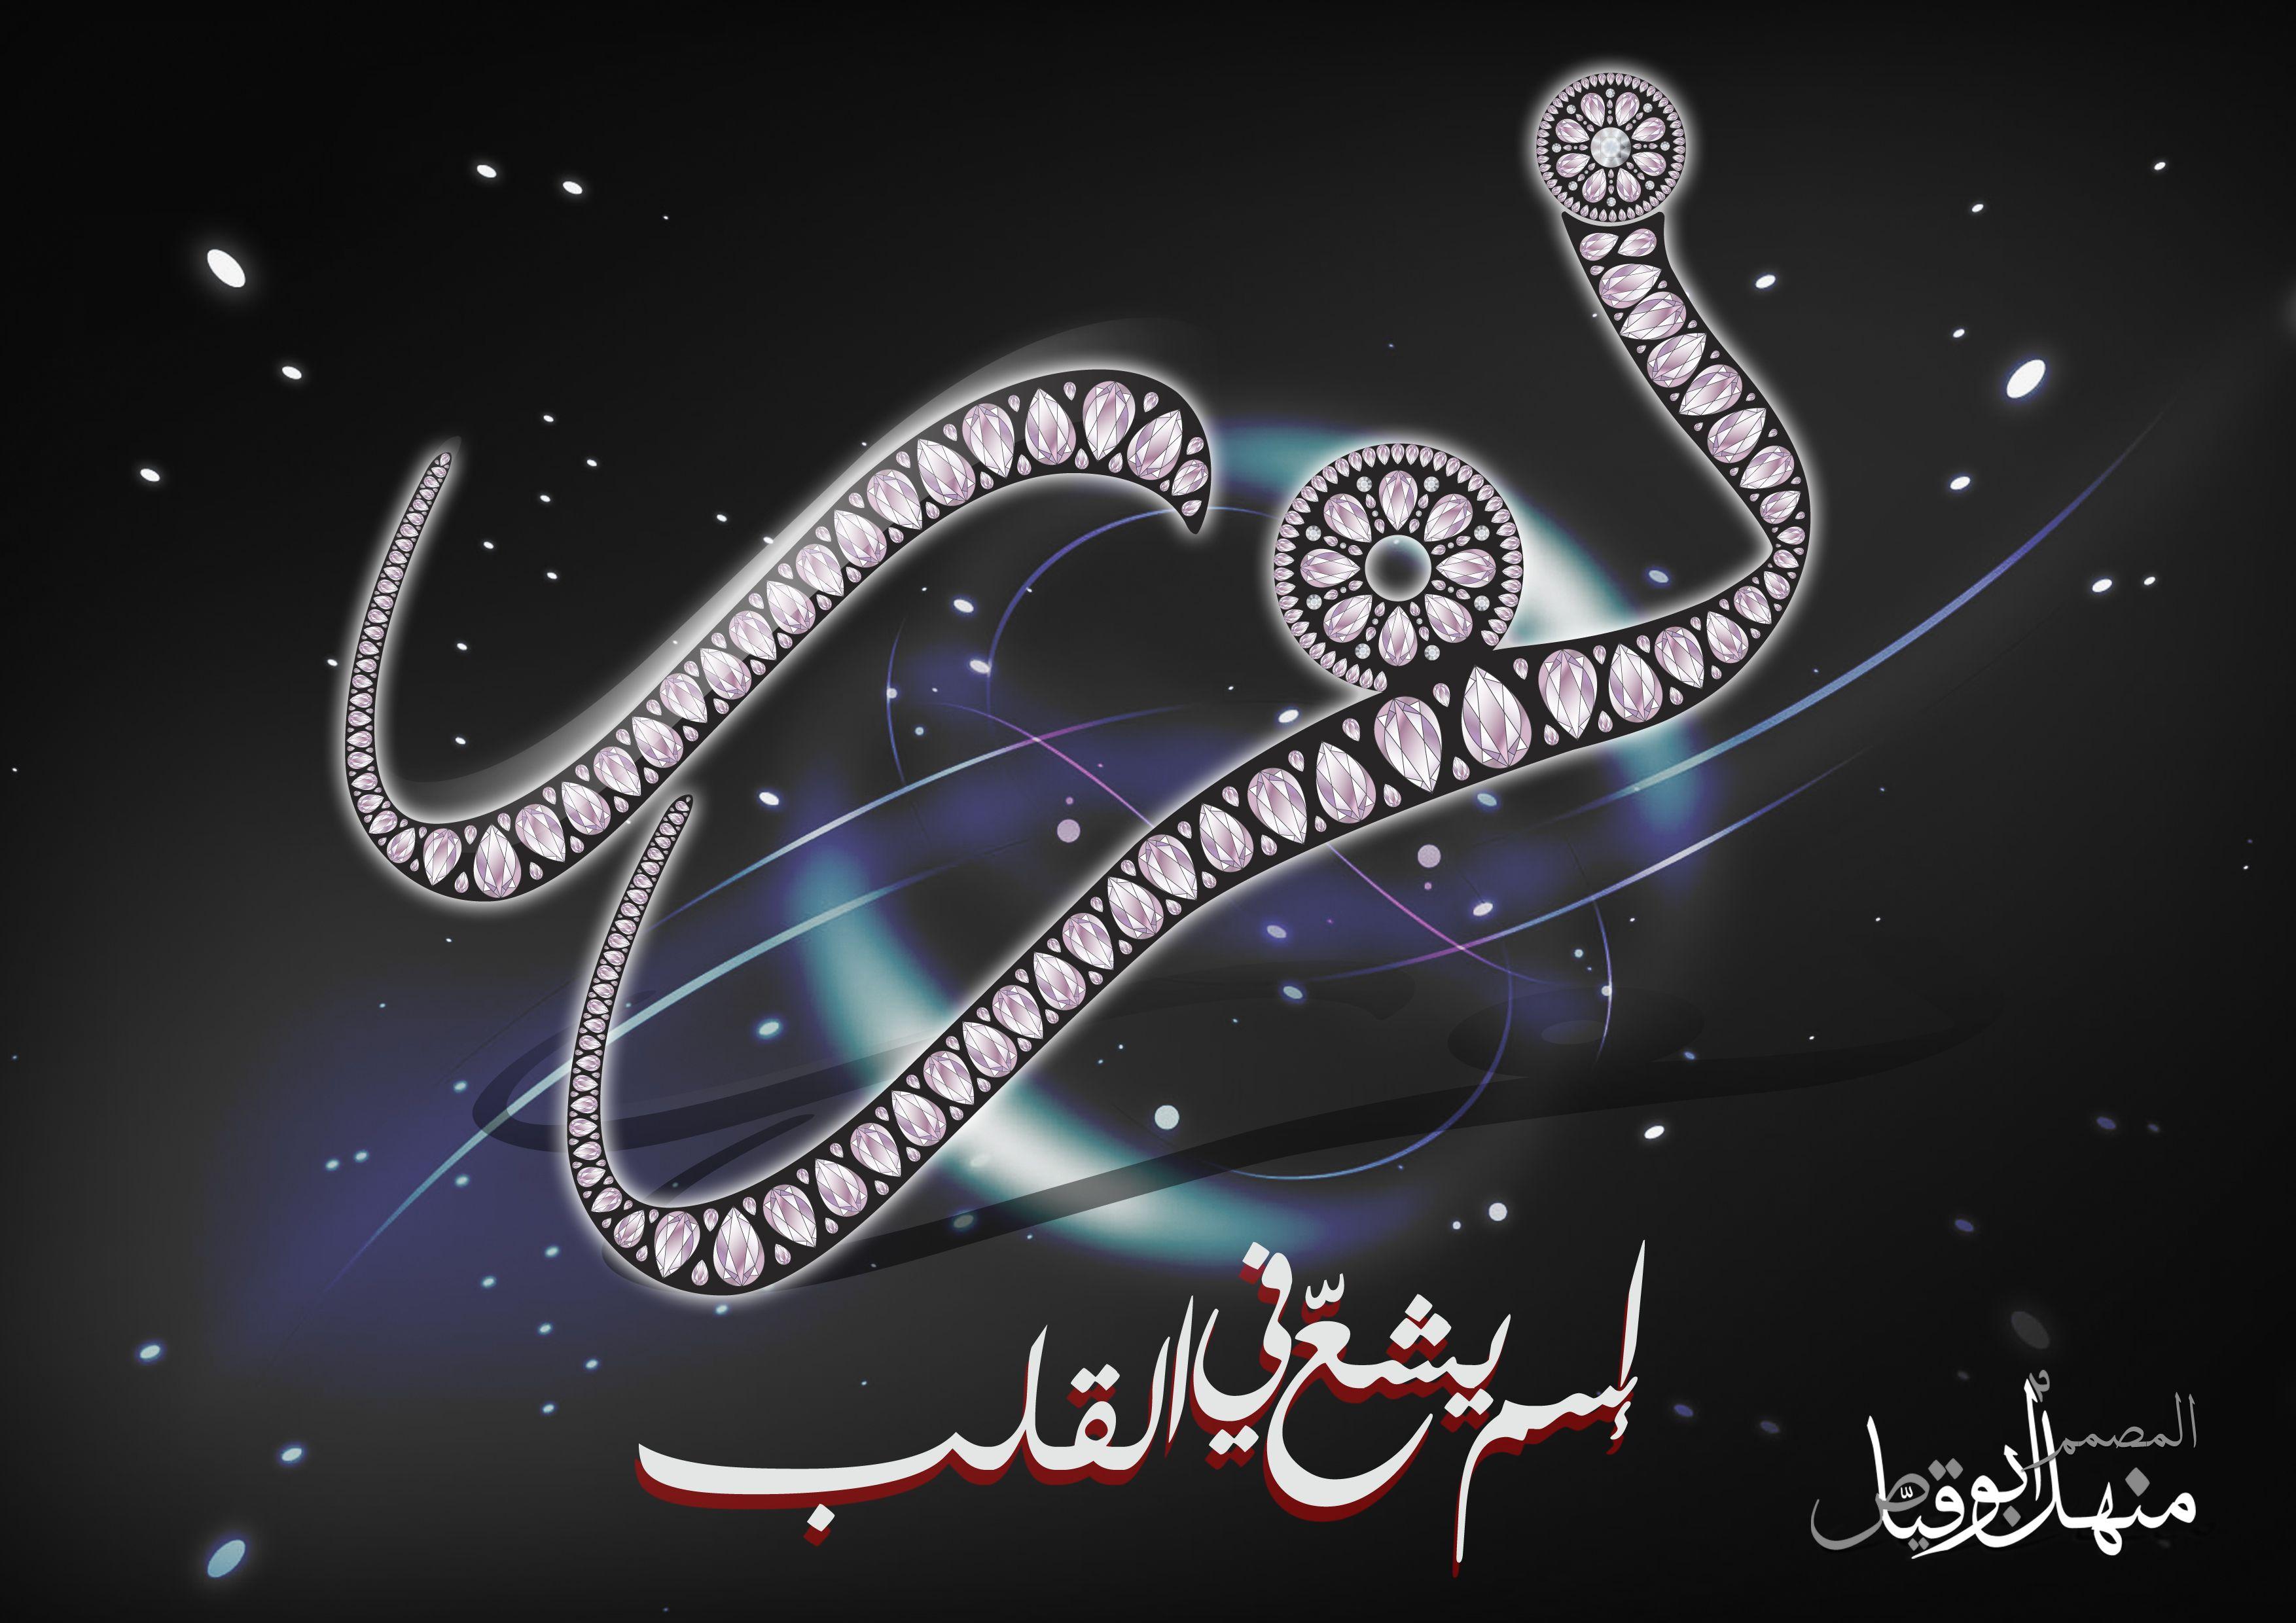 نور اسم يشع في القلب Infinity Necklace Gold Decorative Letters Fake Photo